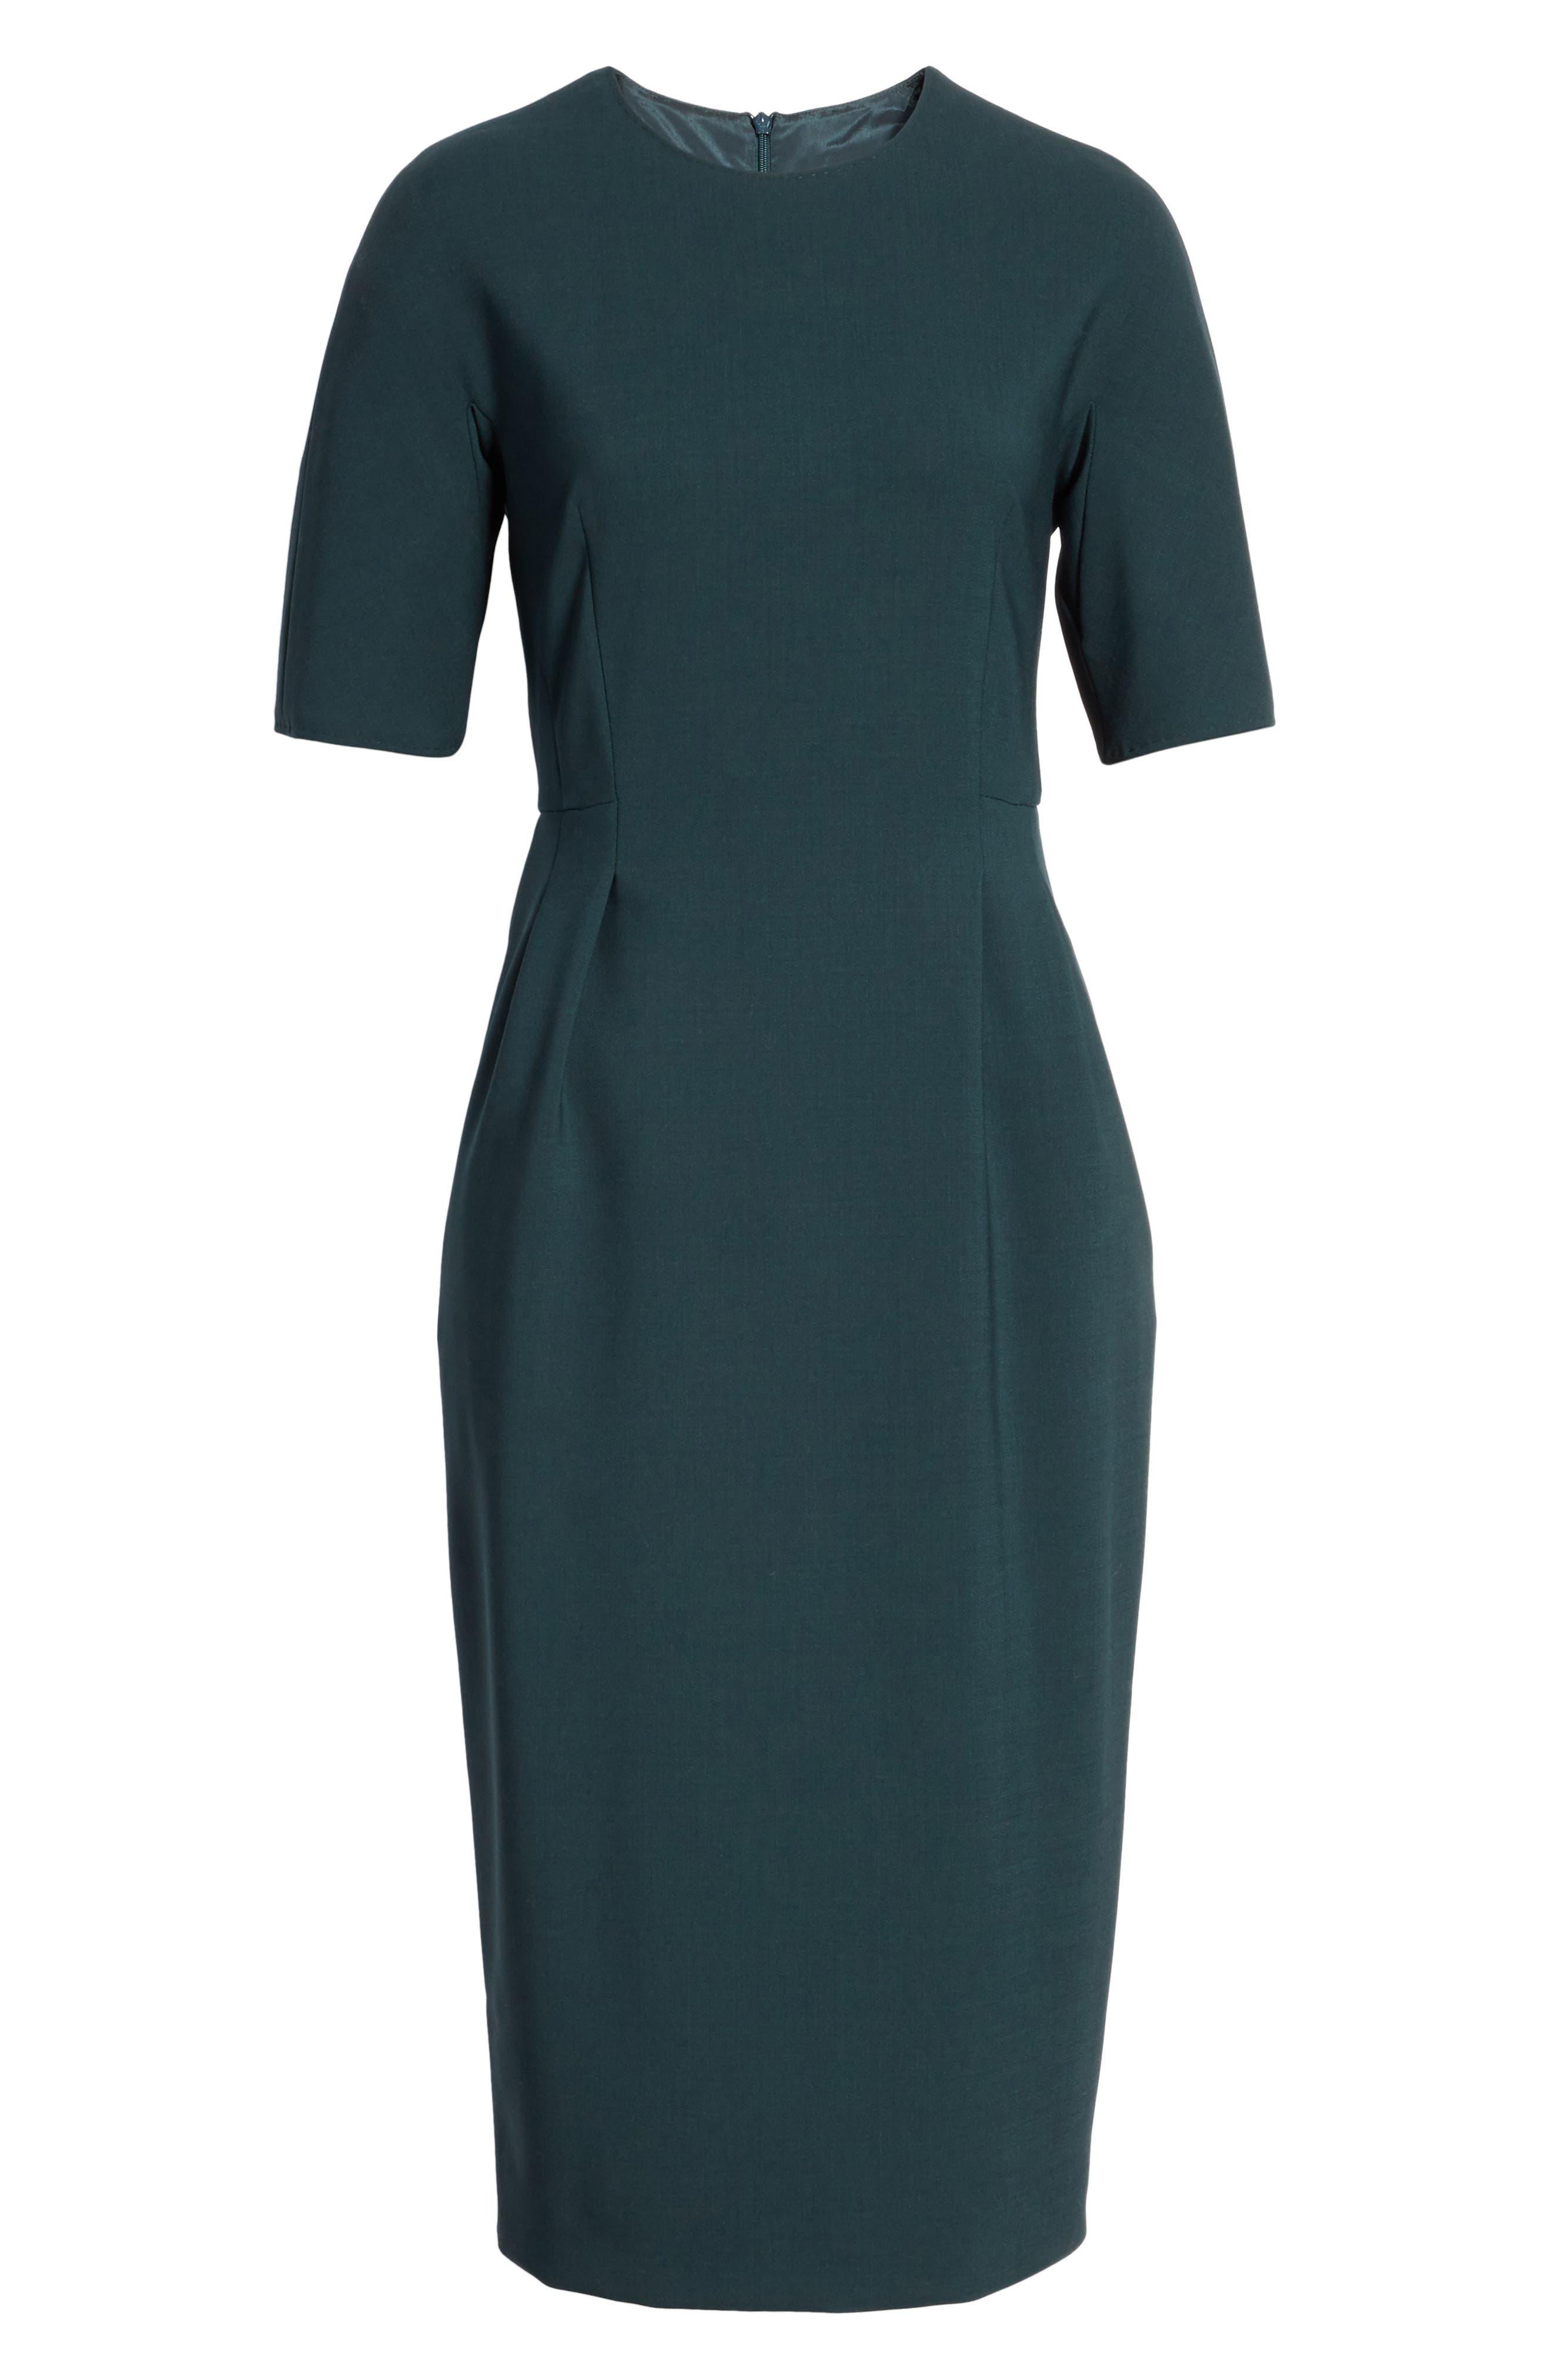 Umano Stretch Wool Sheath Dress,                             Alternate thumbnail 7, color,                             Dark Green